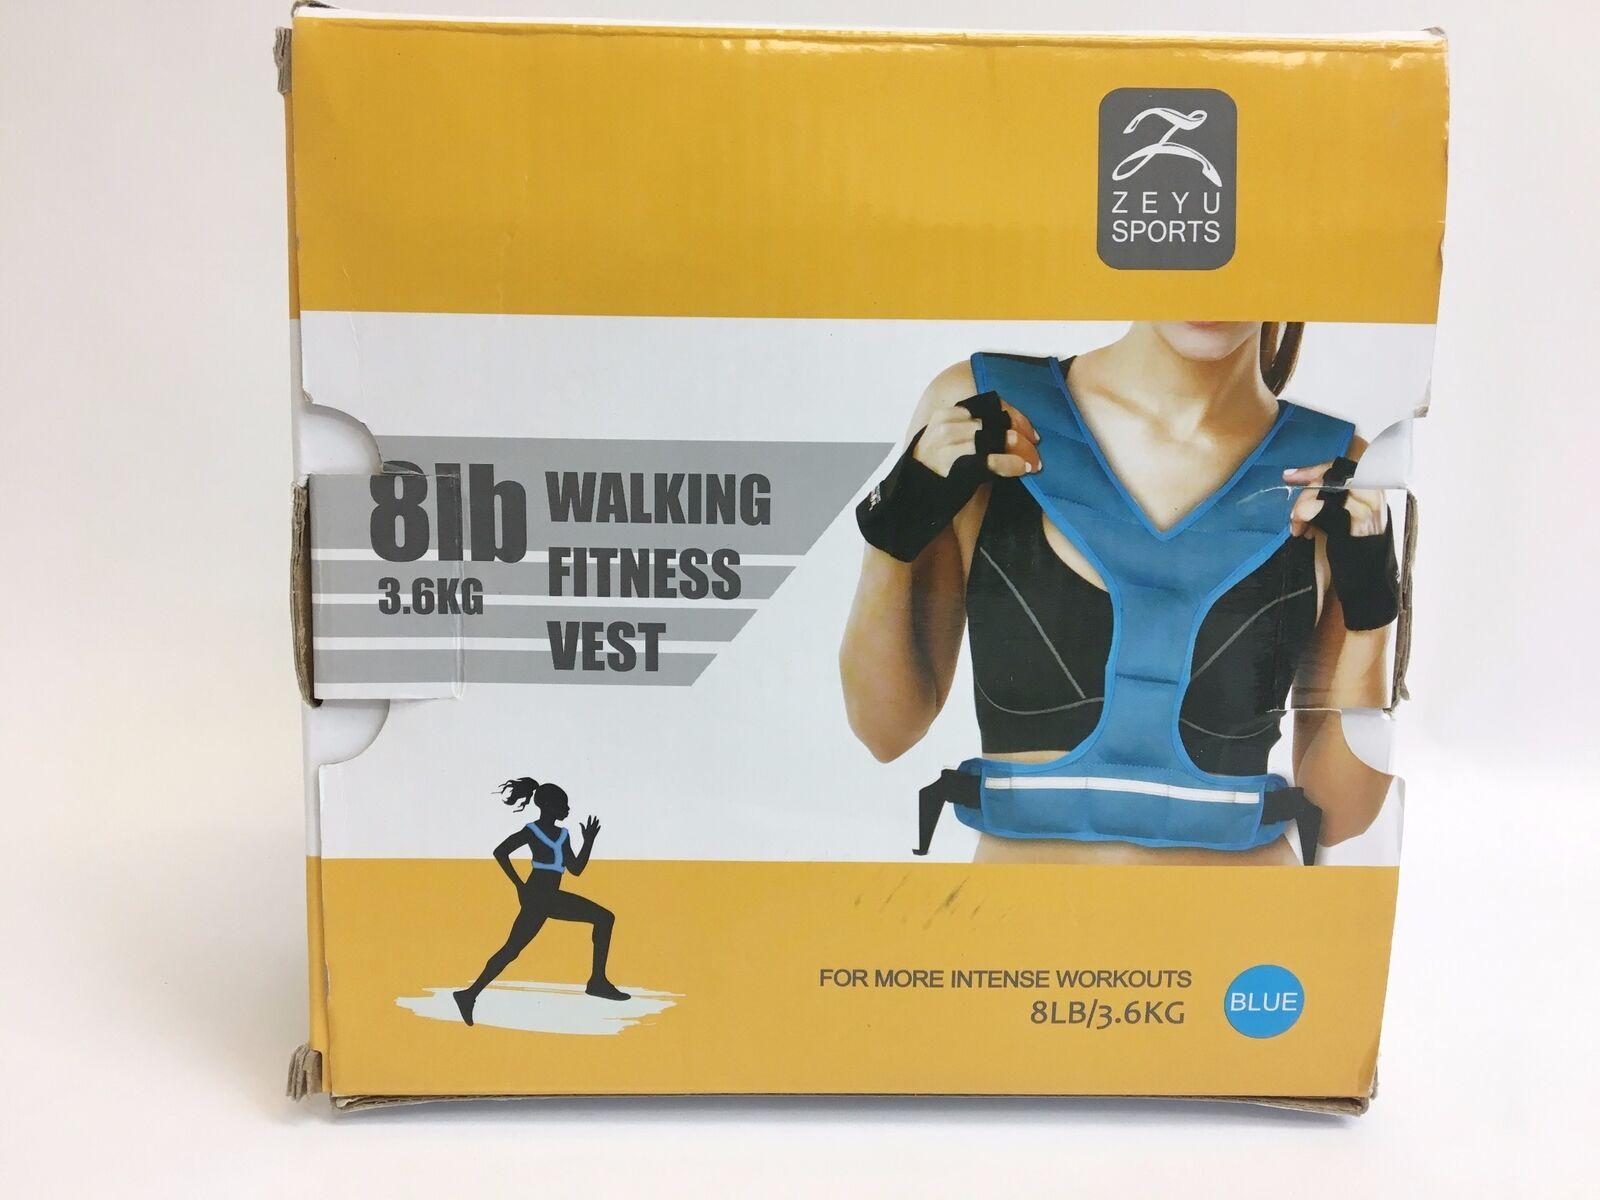 Zeyu  Sports 8 lb Walking Fitness Vest - bluee  big sale